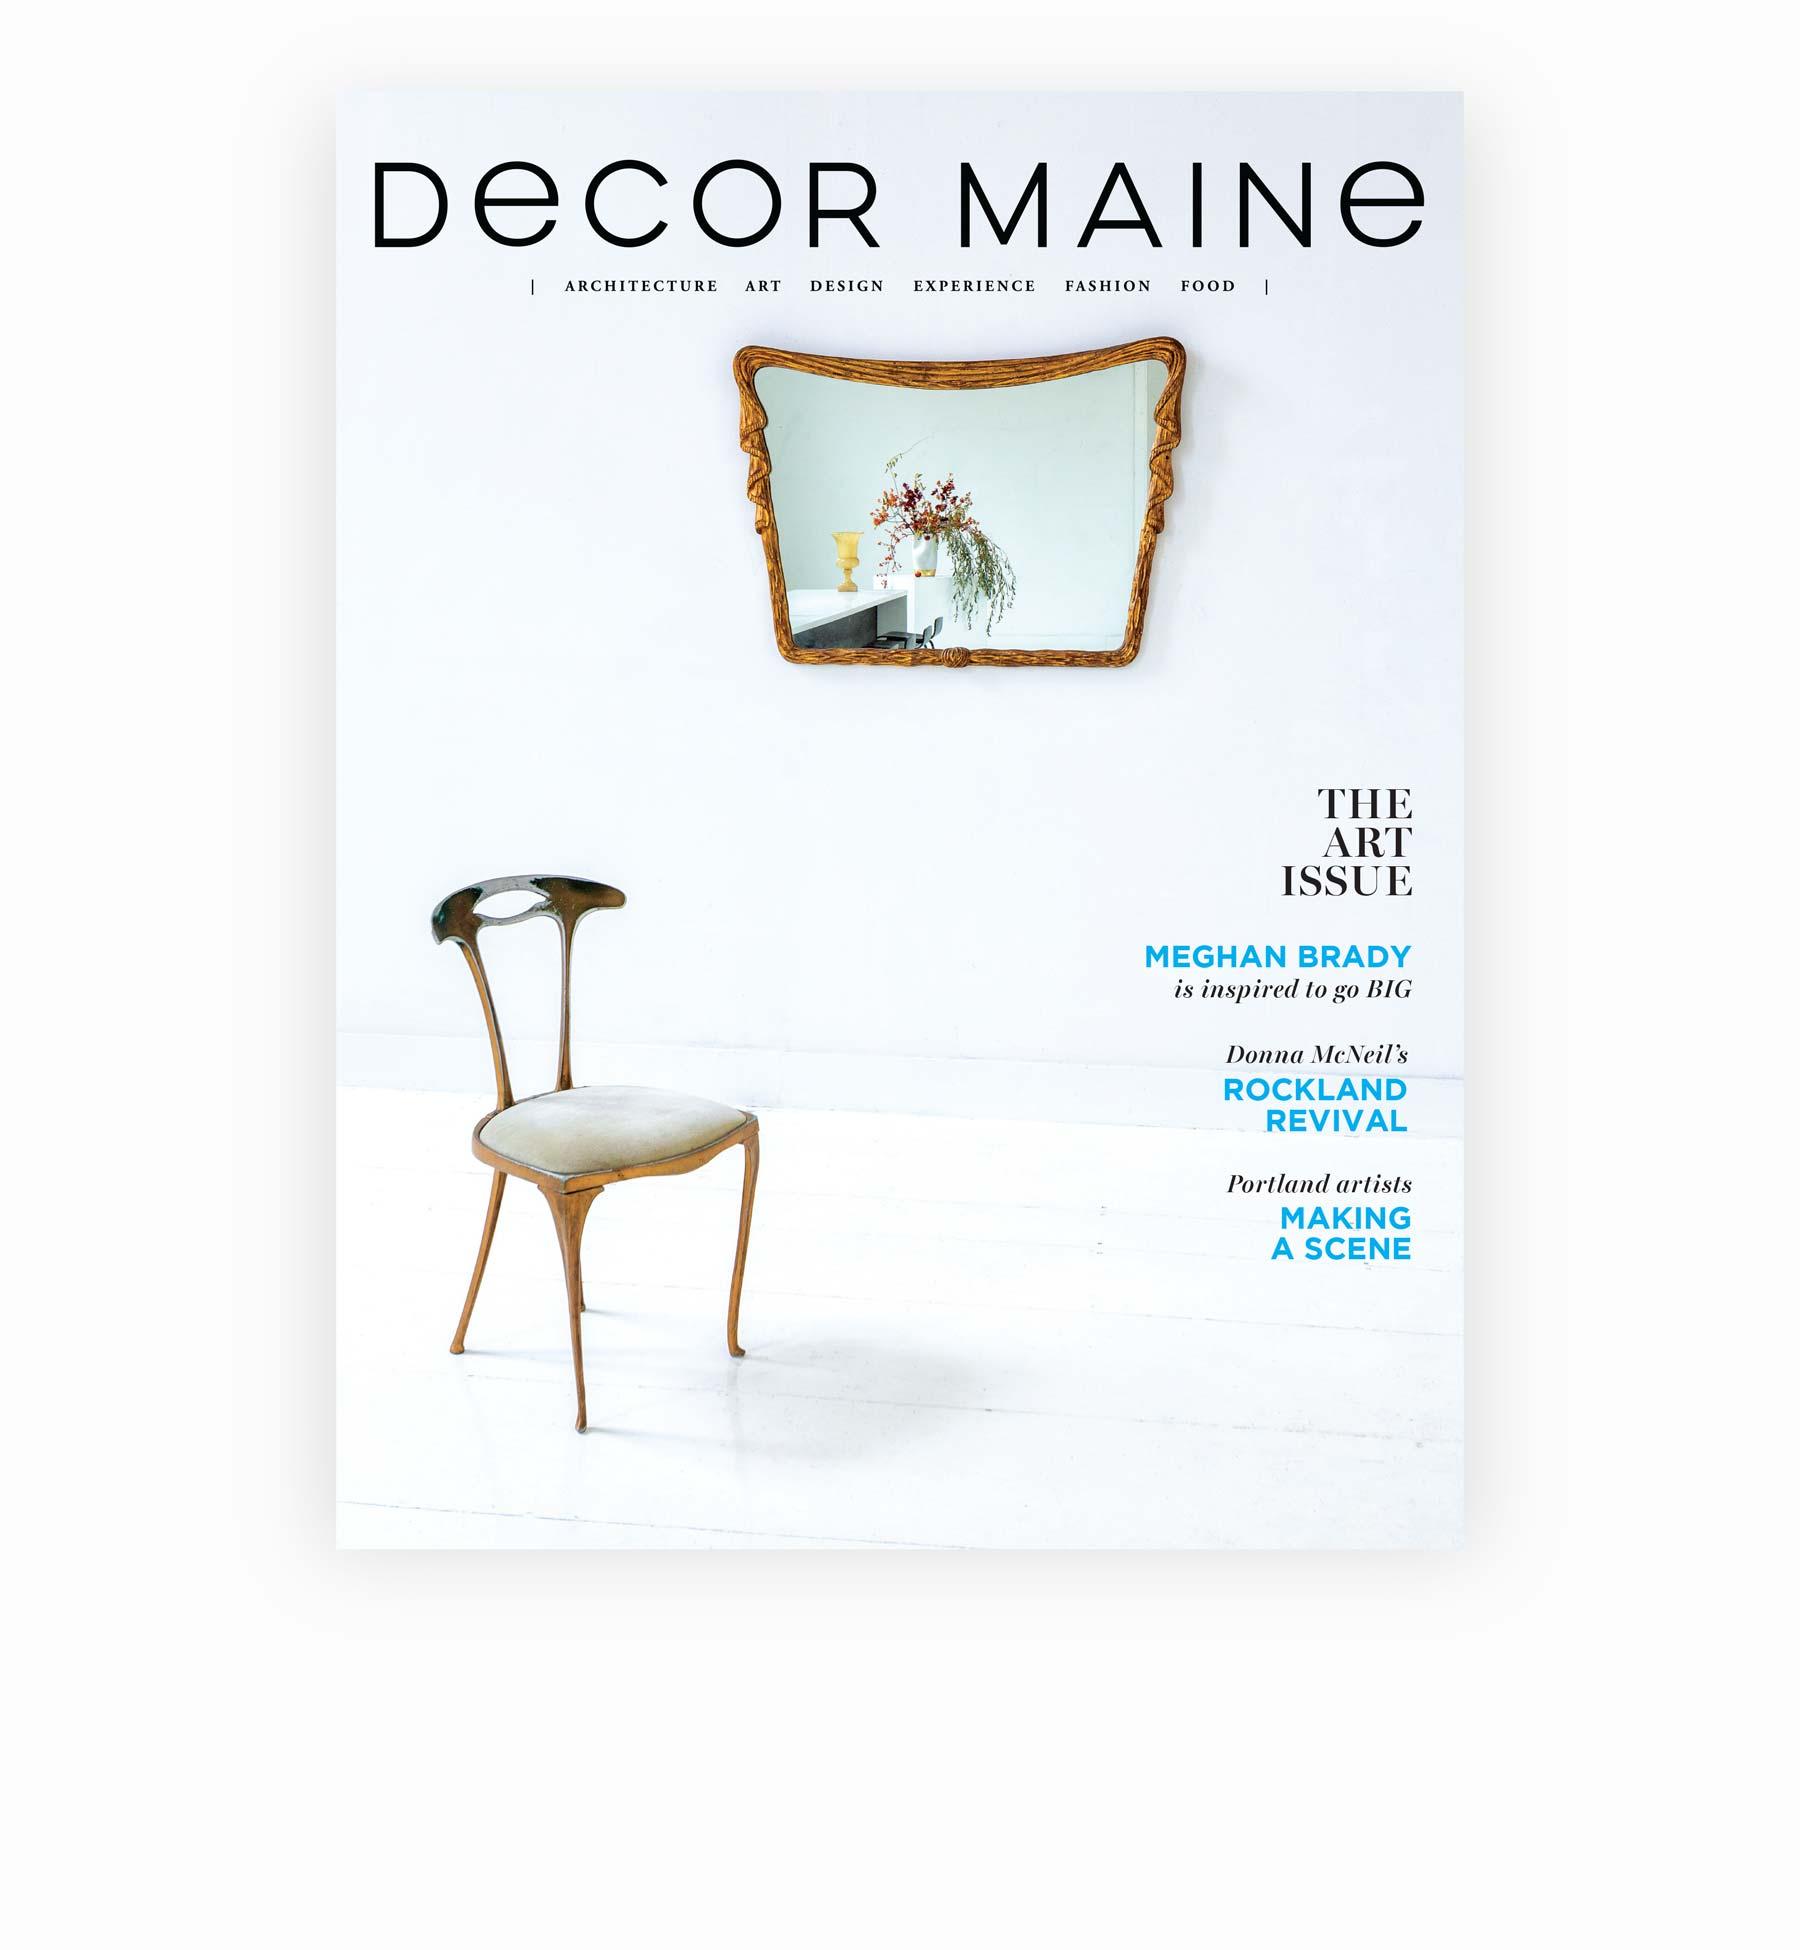 decor-maine-art-issue-3.jpg